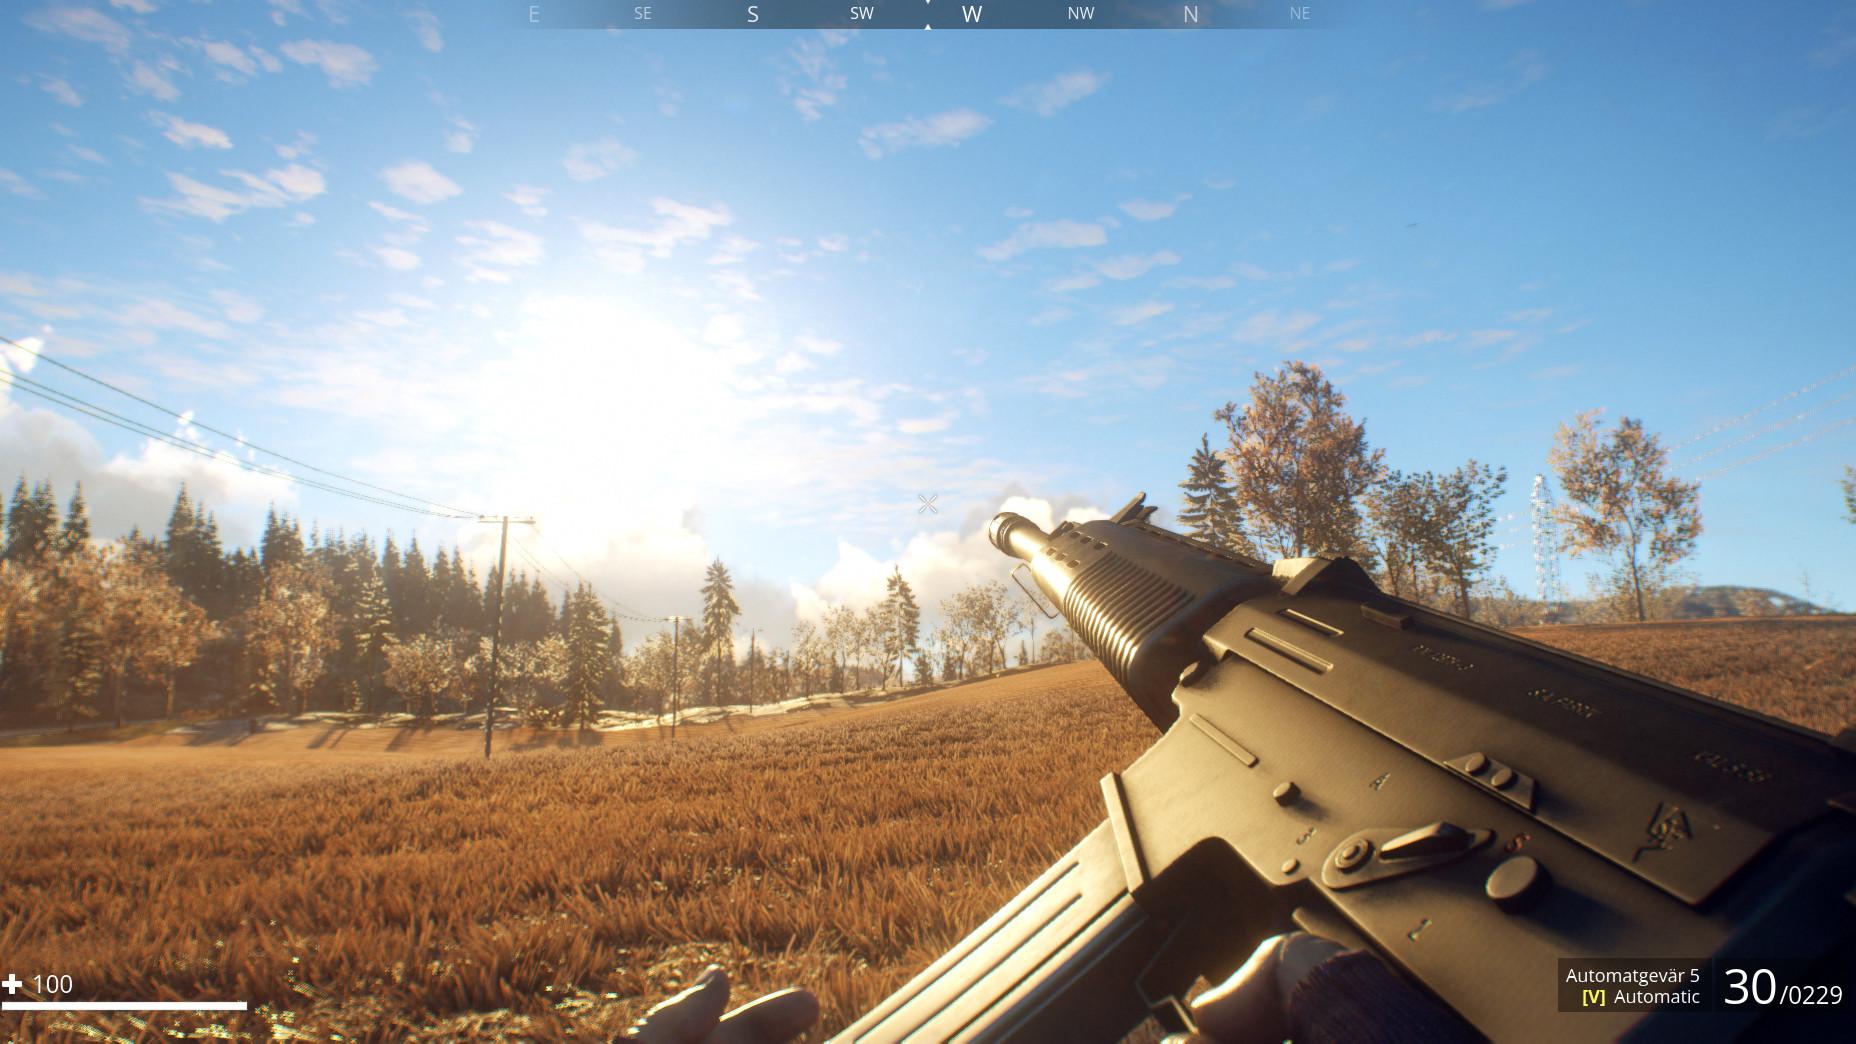 Daniel ketterman assault rifle6 ig